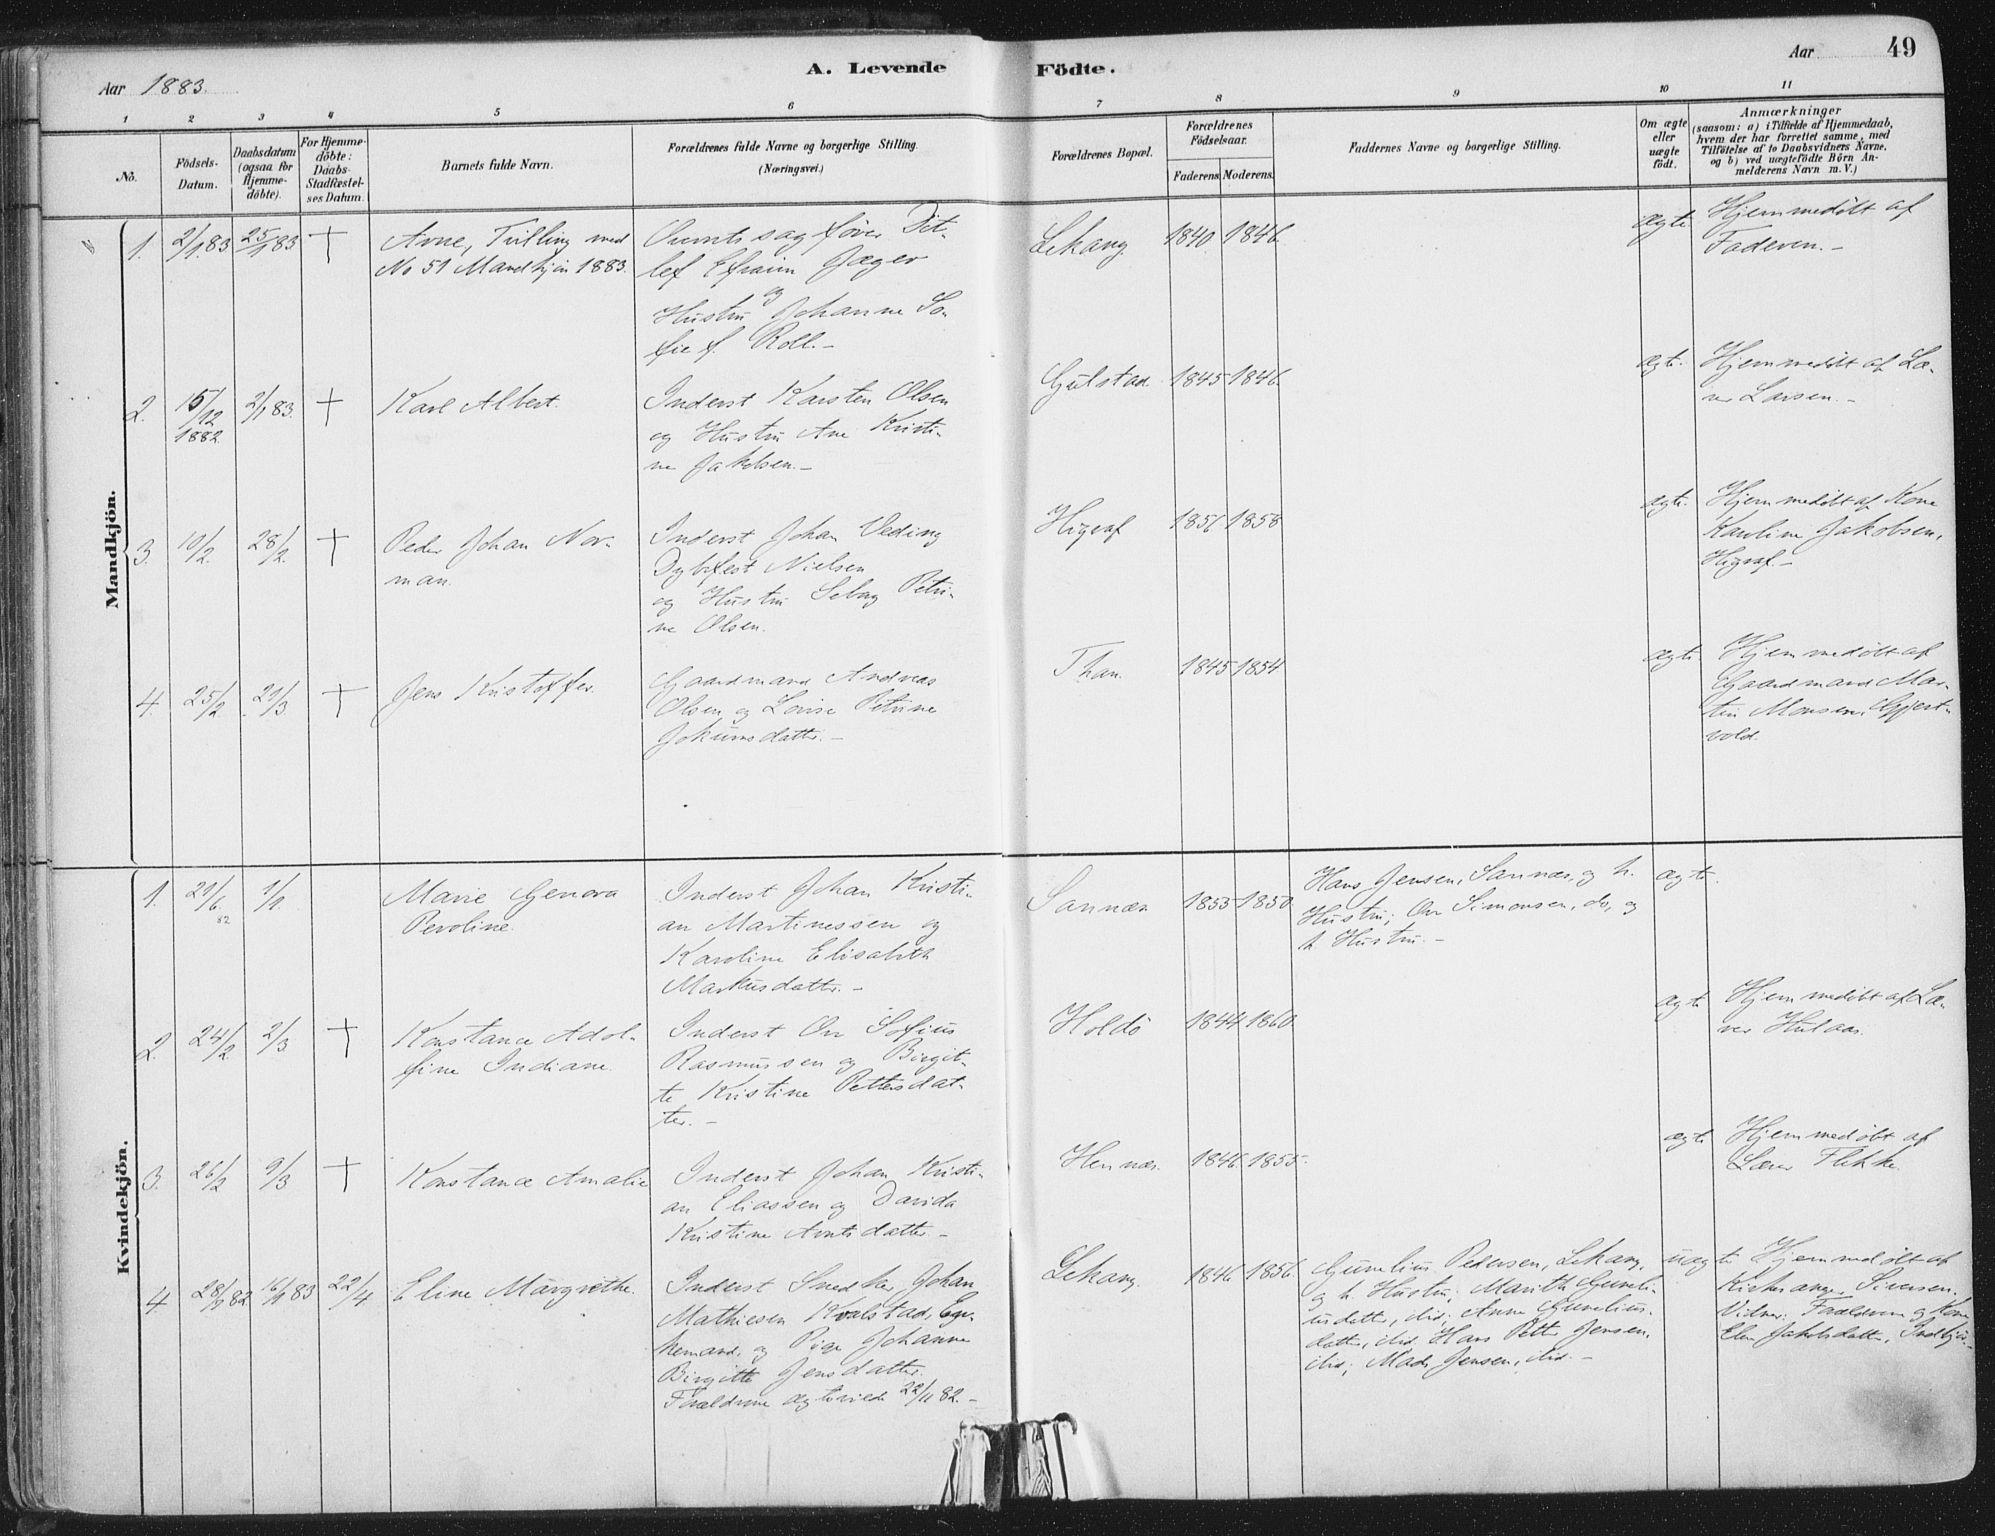 SAT, Ministerialprotokoller, klokkerbøker og fødselsregistre - Nordland, 888/L1244: Ministerialbok nr. 888A10, 1880-1890, s. 49